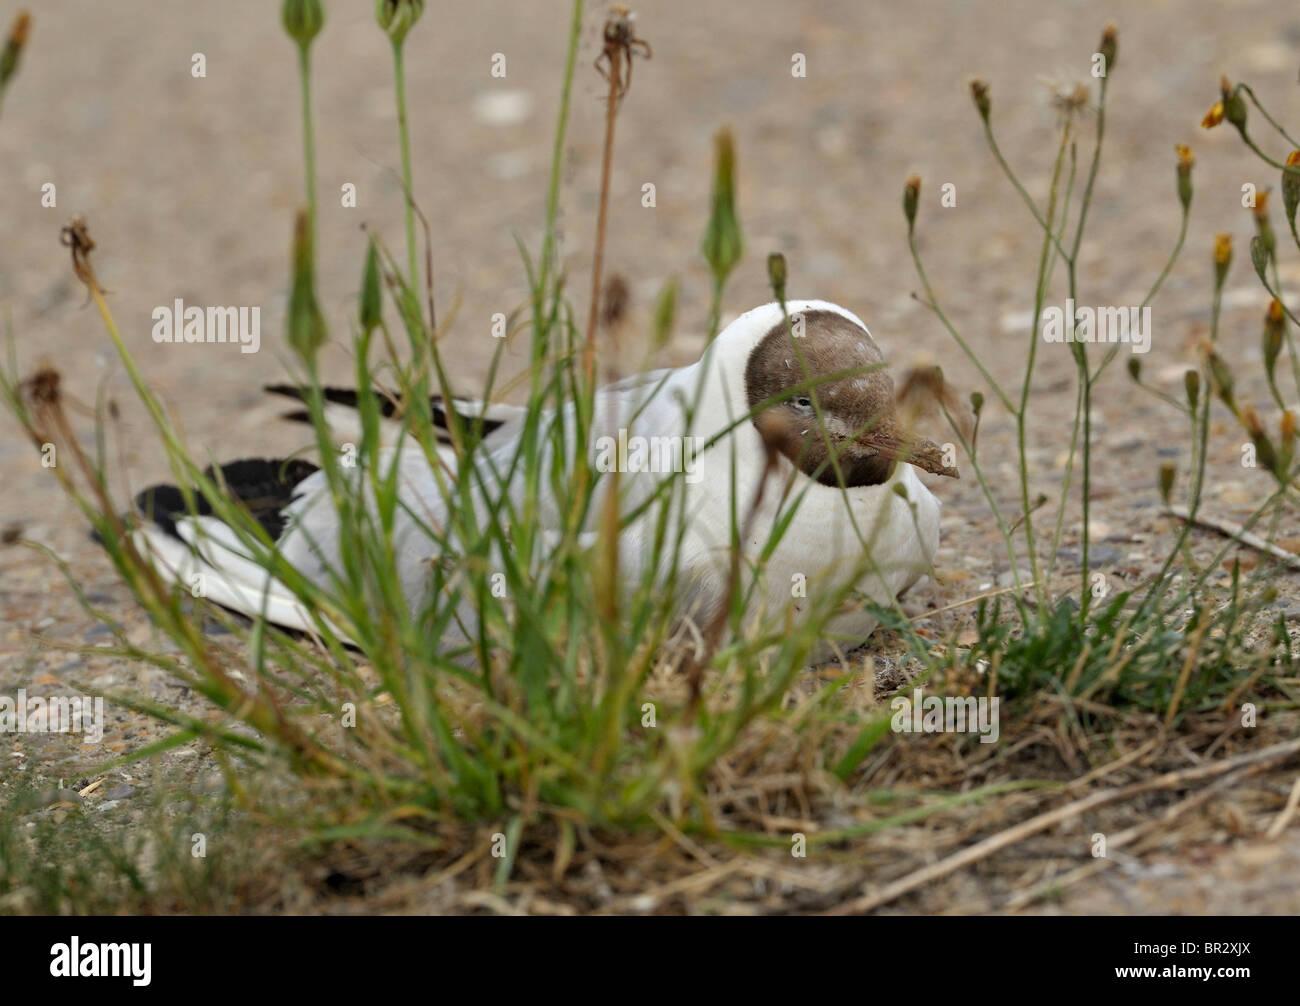 Final hours of an aged Black Headed Gull. Larus ridibundus - Stock Image